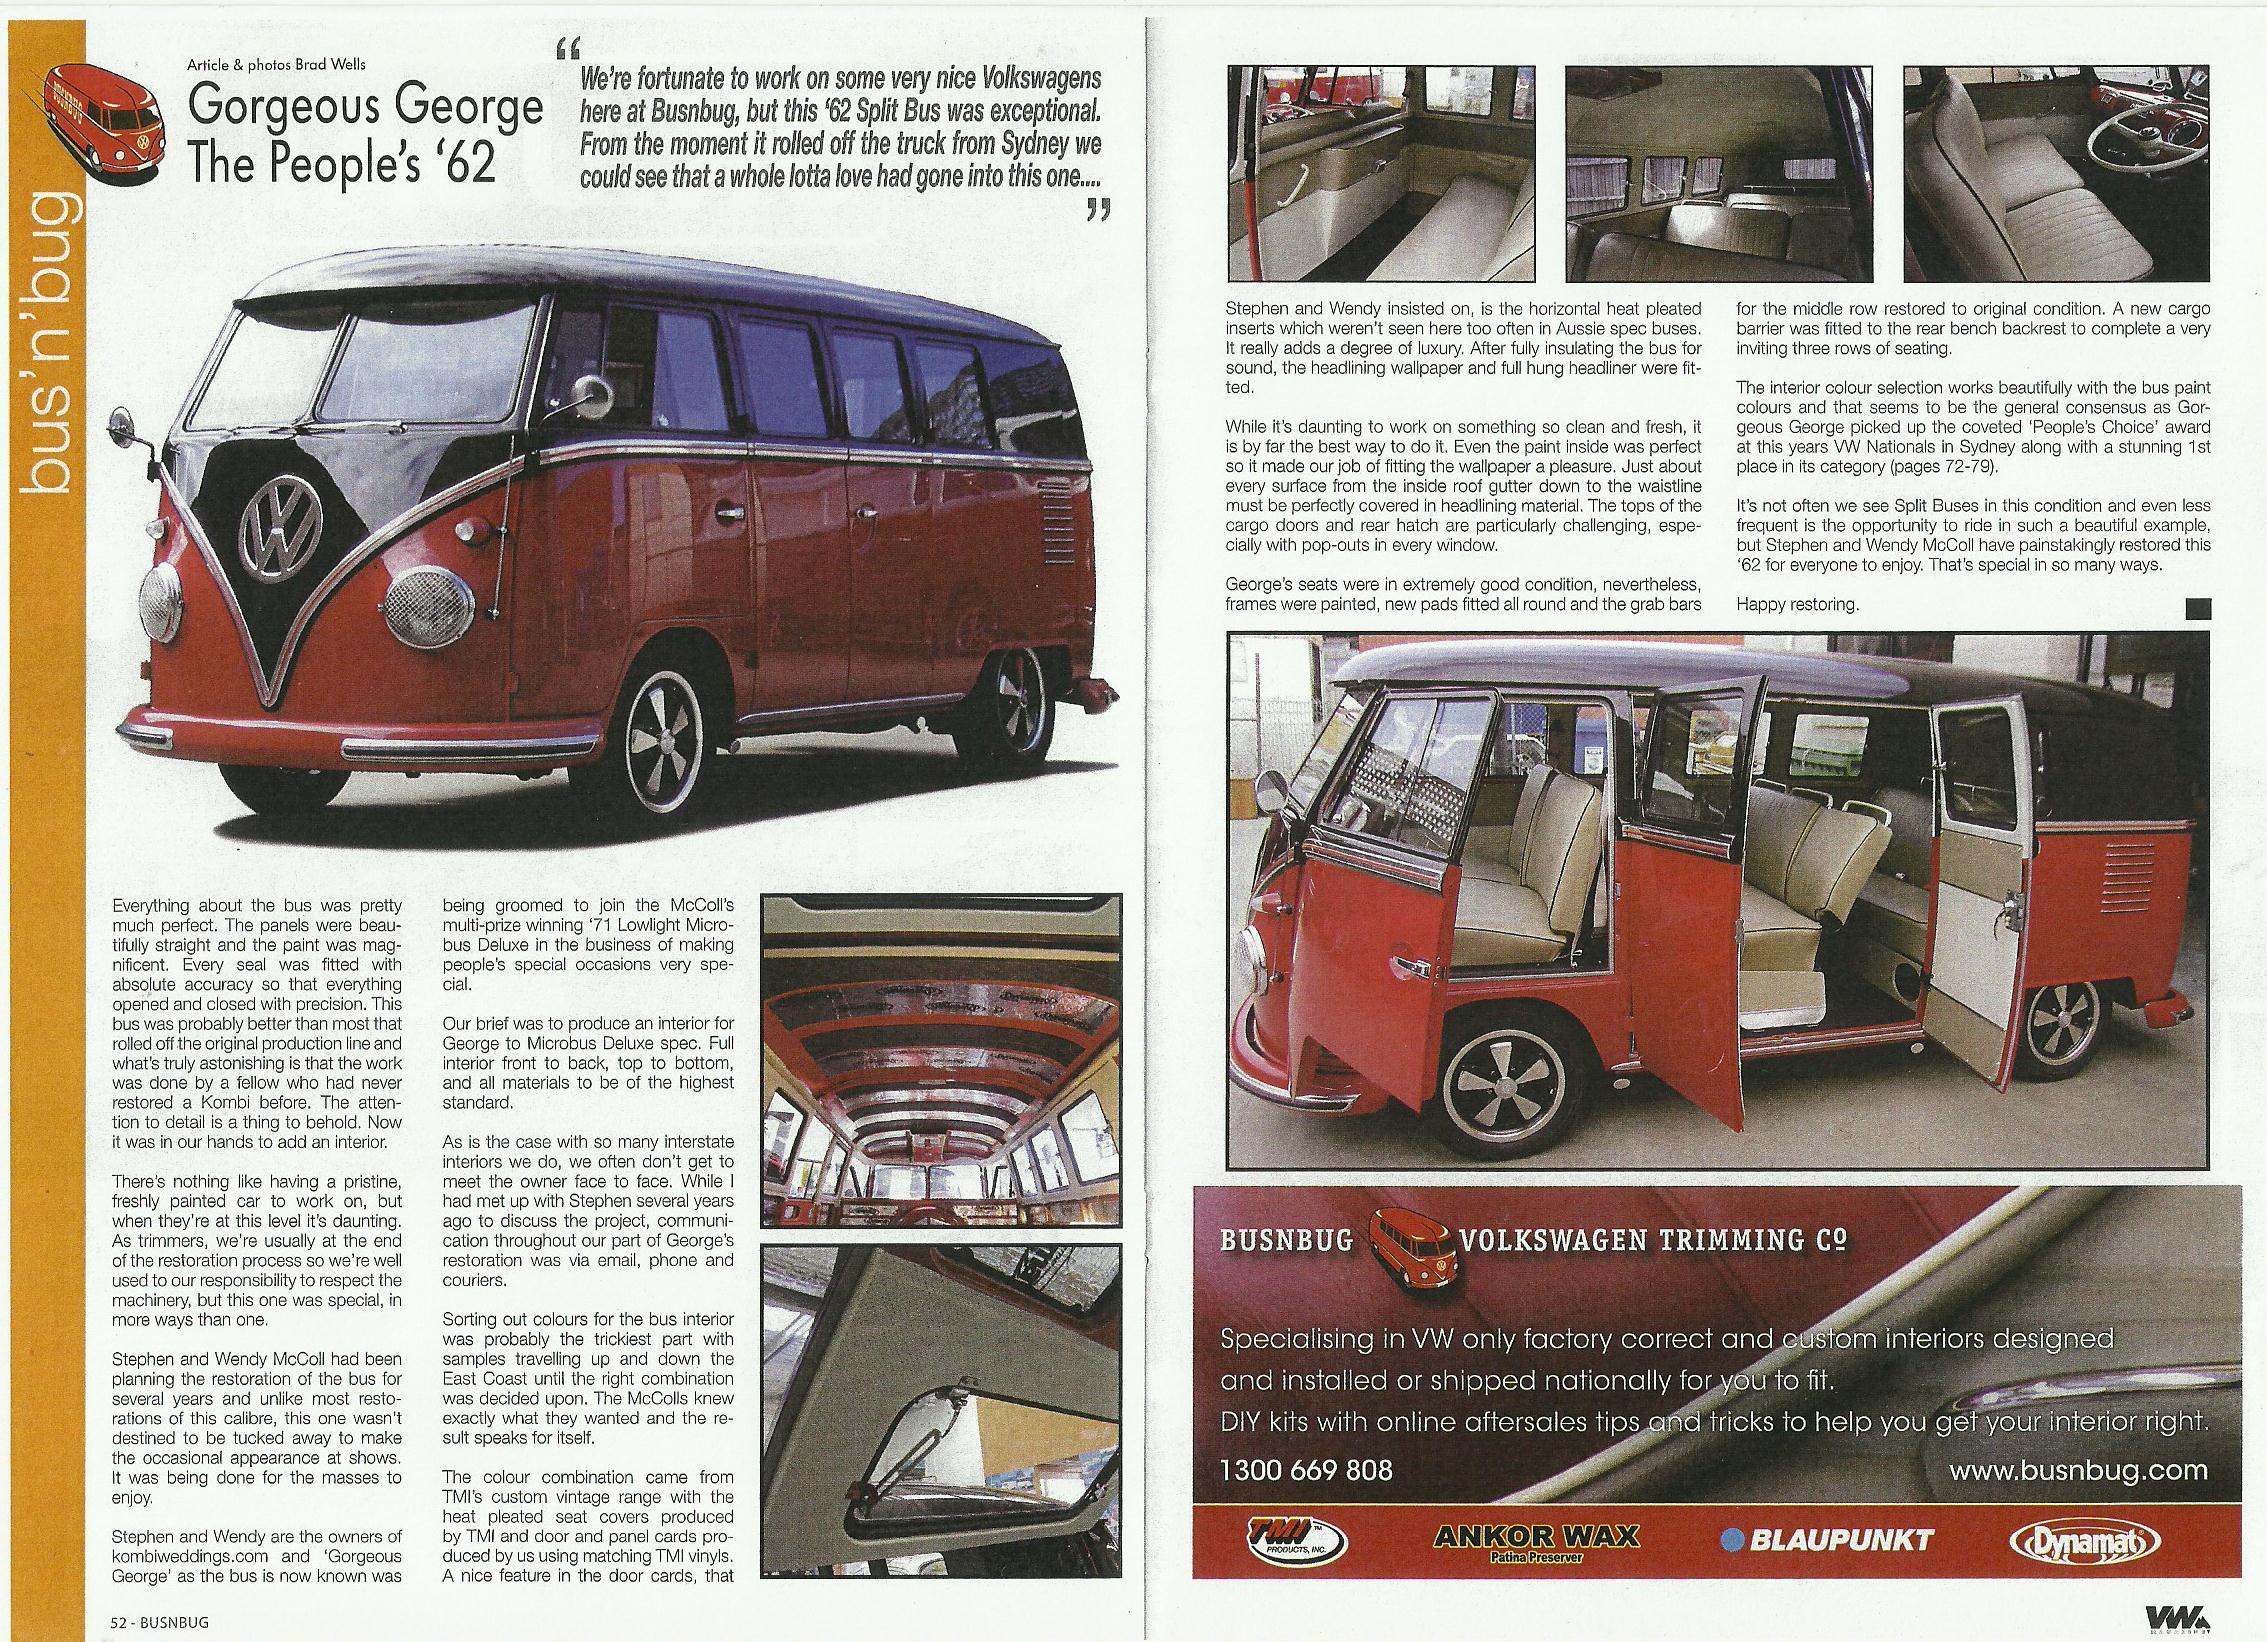 VW magazine p52 2013.jpg